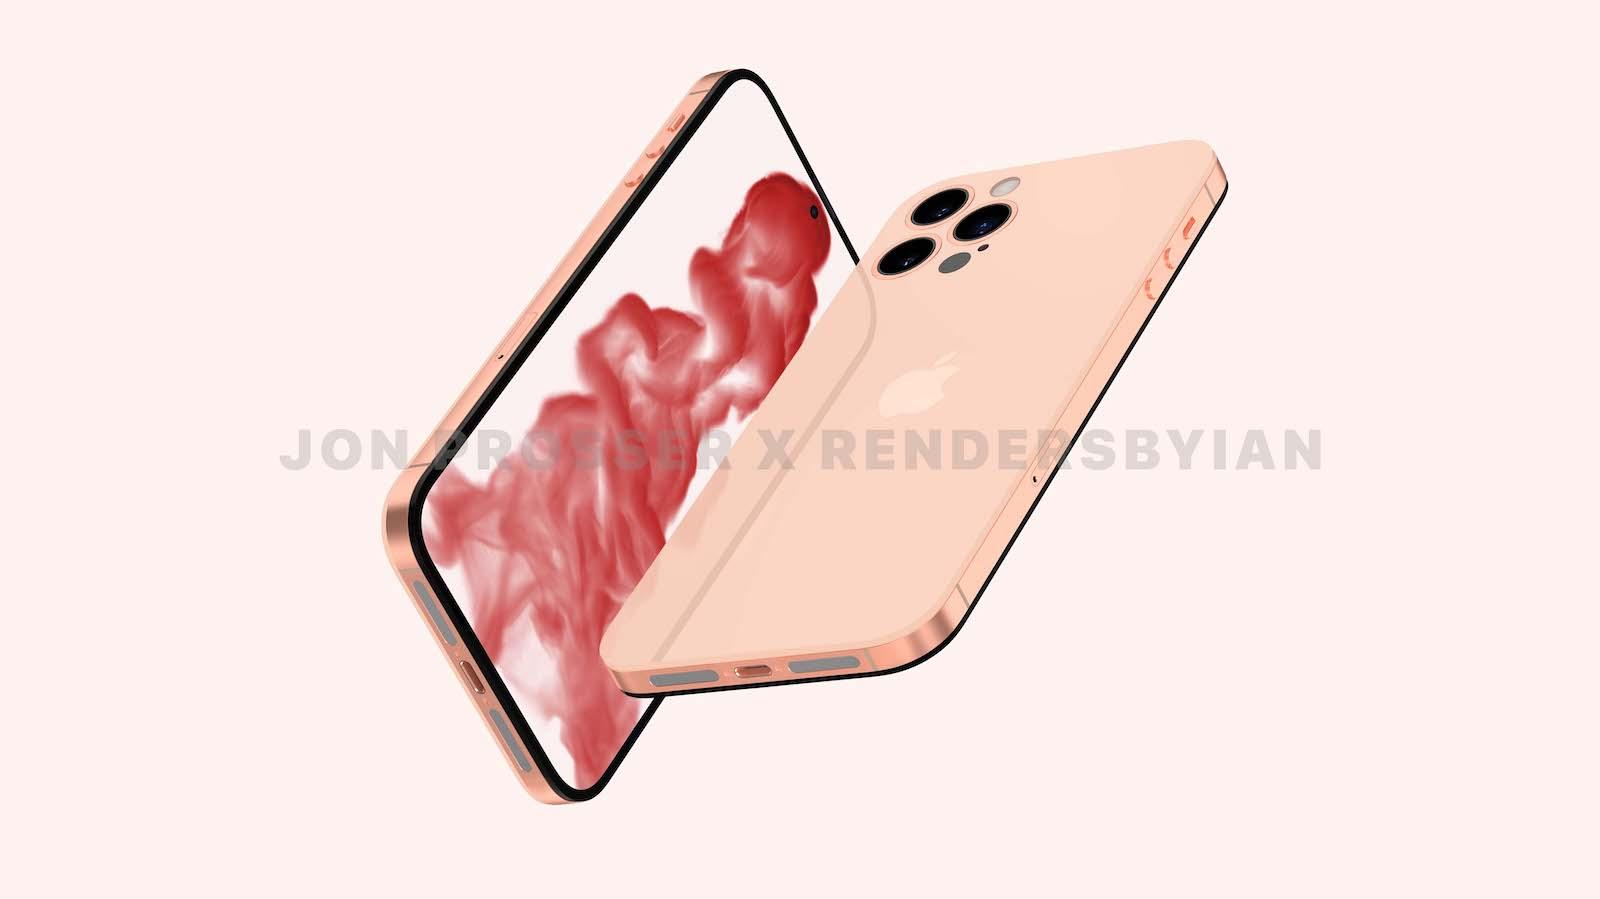 Iphone 14 press 5 0 5x